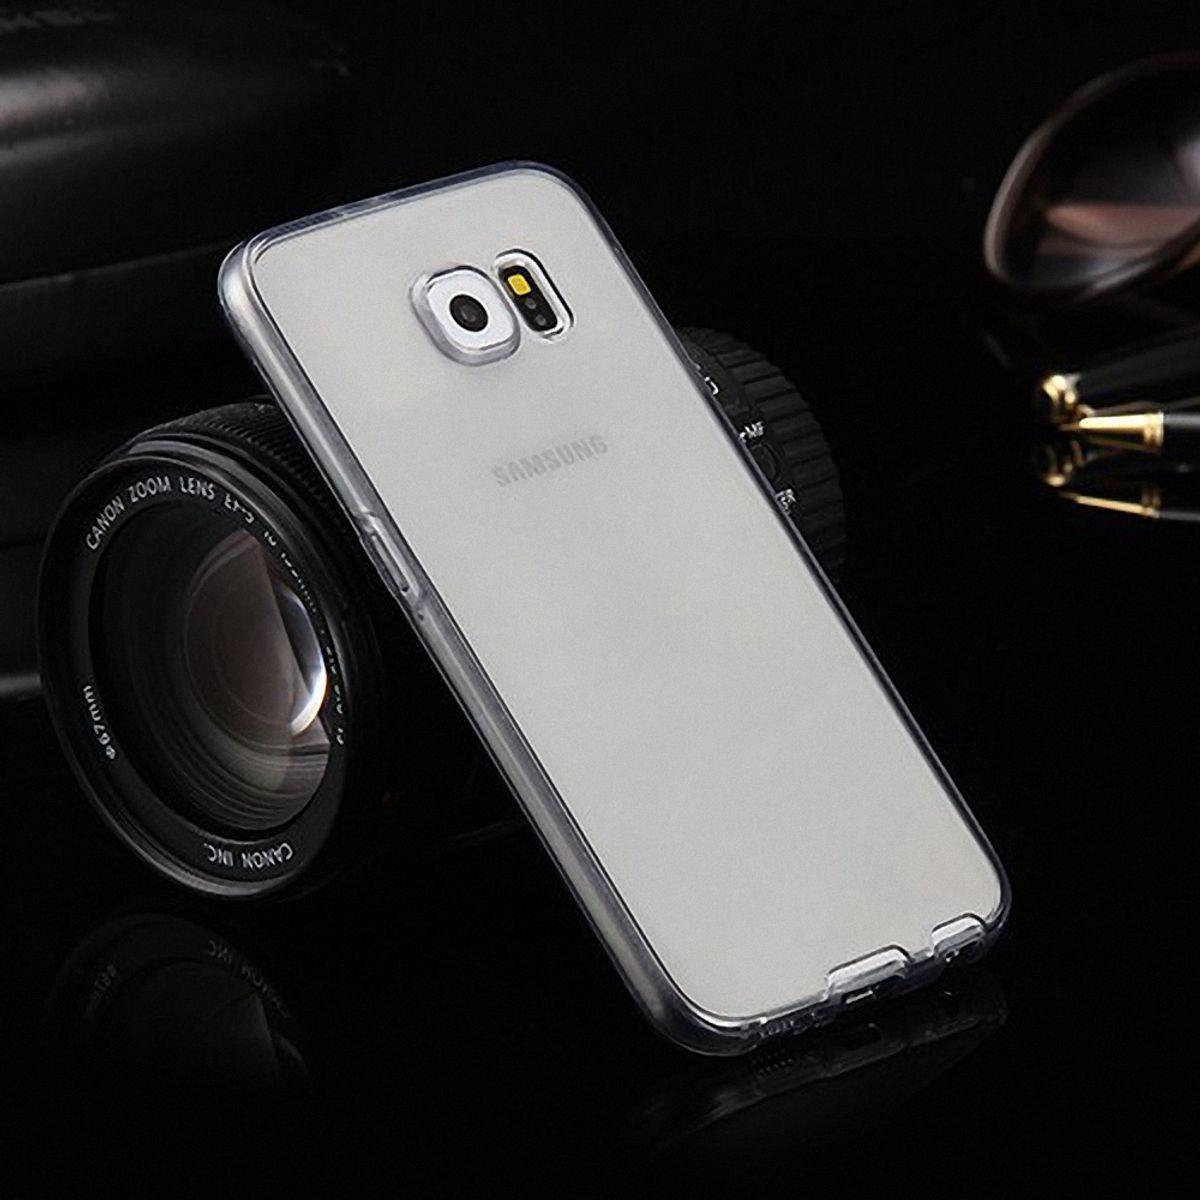 Crystal Case Hülle für Motorola Moto X Style Grau Rahmen Full Body